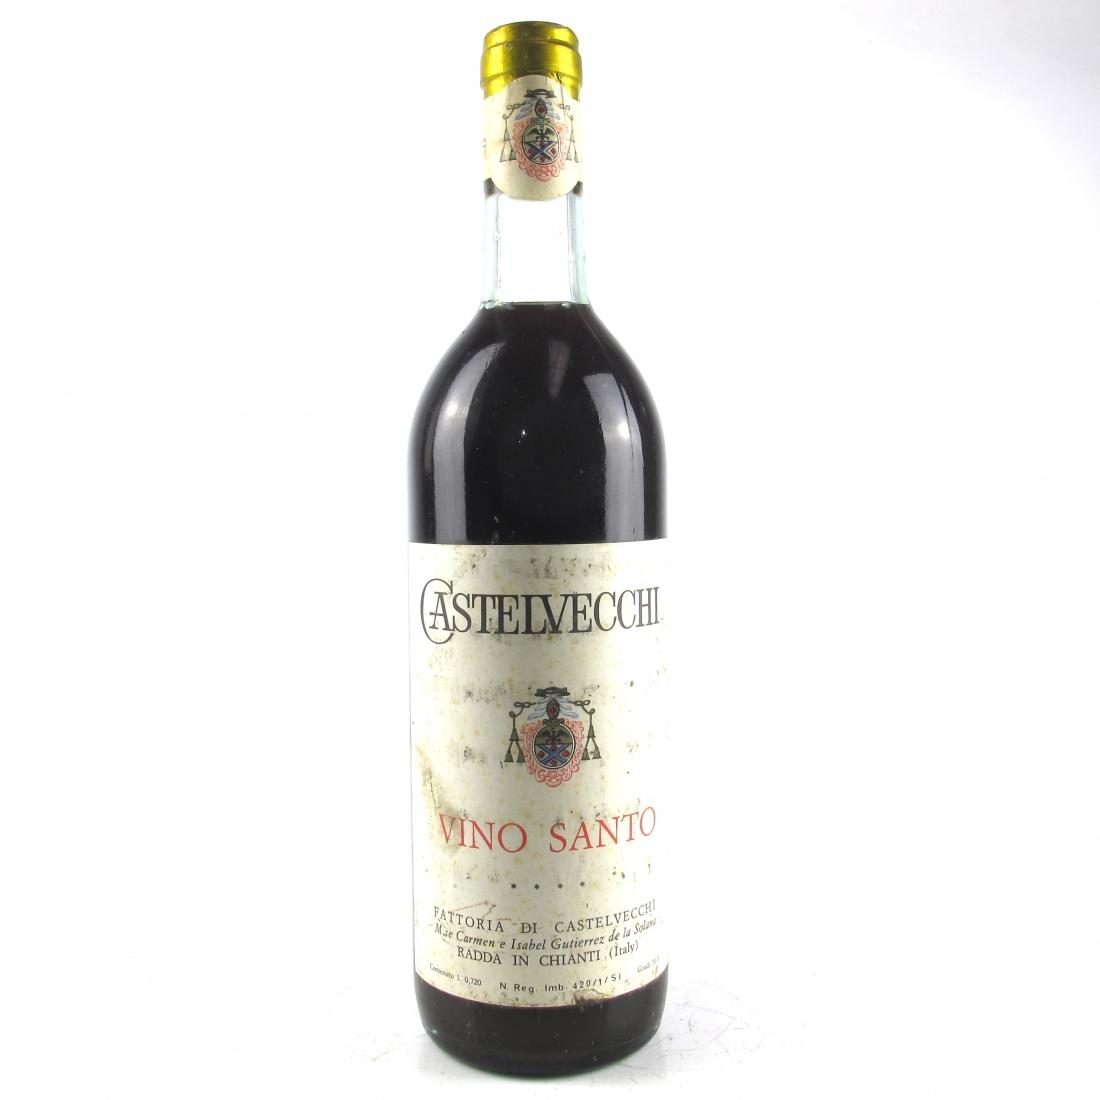 Castelvecchi NV Vin Santo